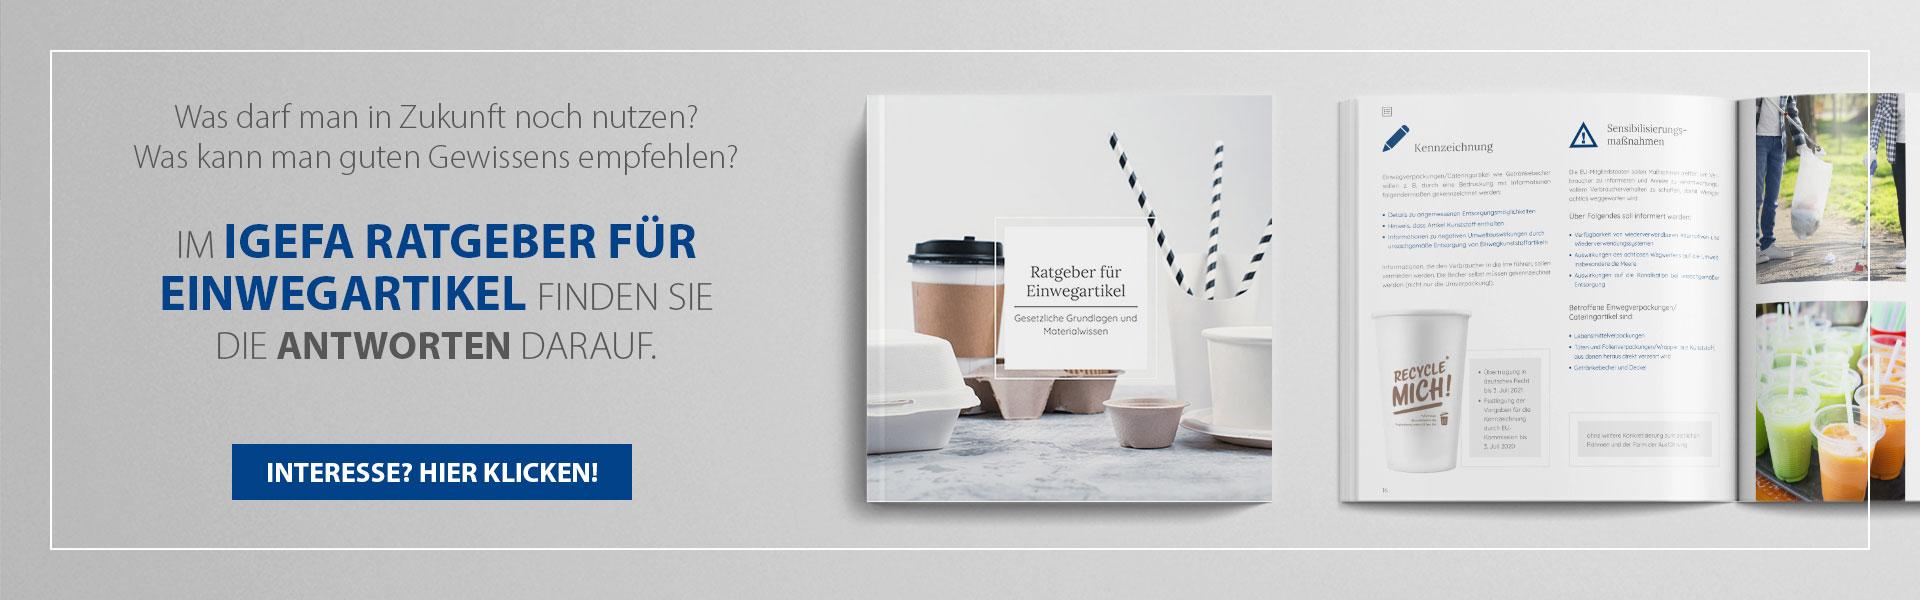 https://www.igefa.de/sites/default/files/revslider/image/Herosilder_Einwegratgeber_1920x600px_0.jpg